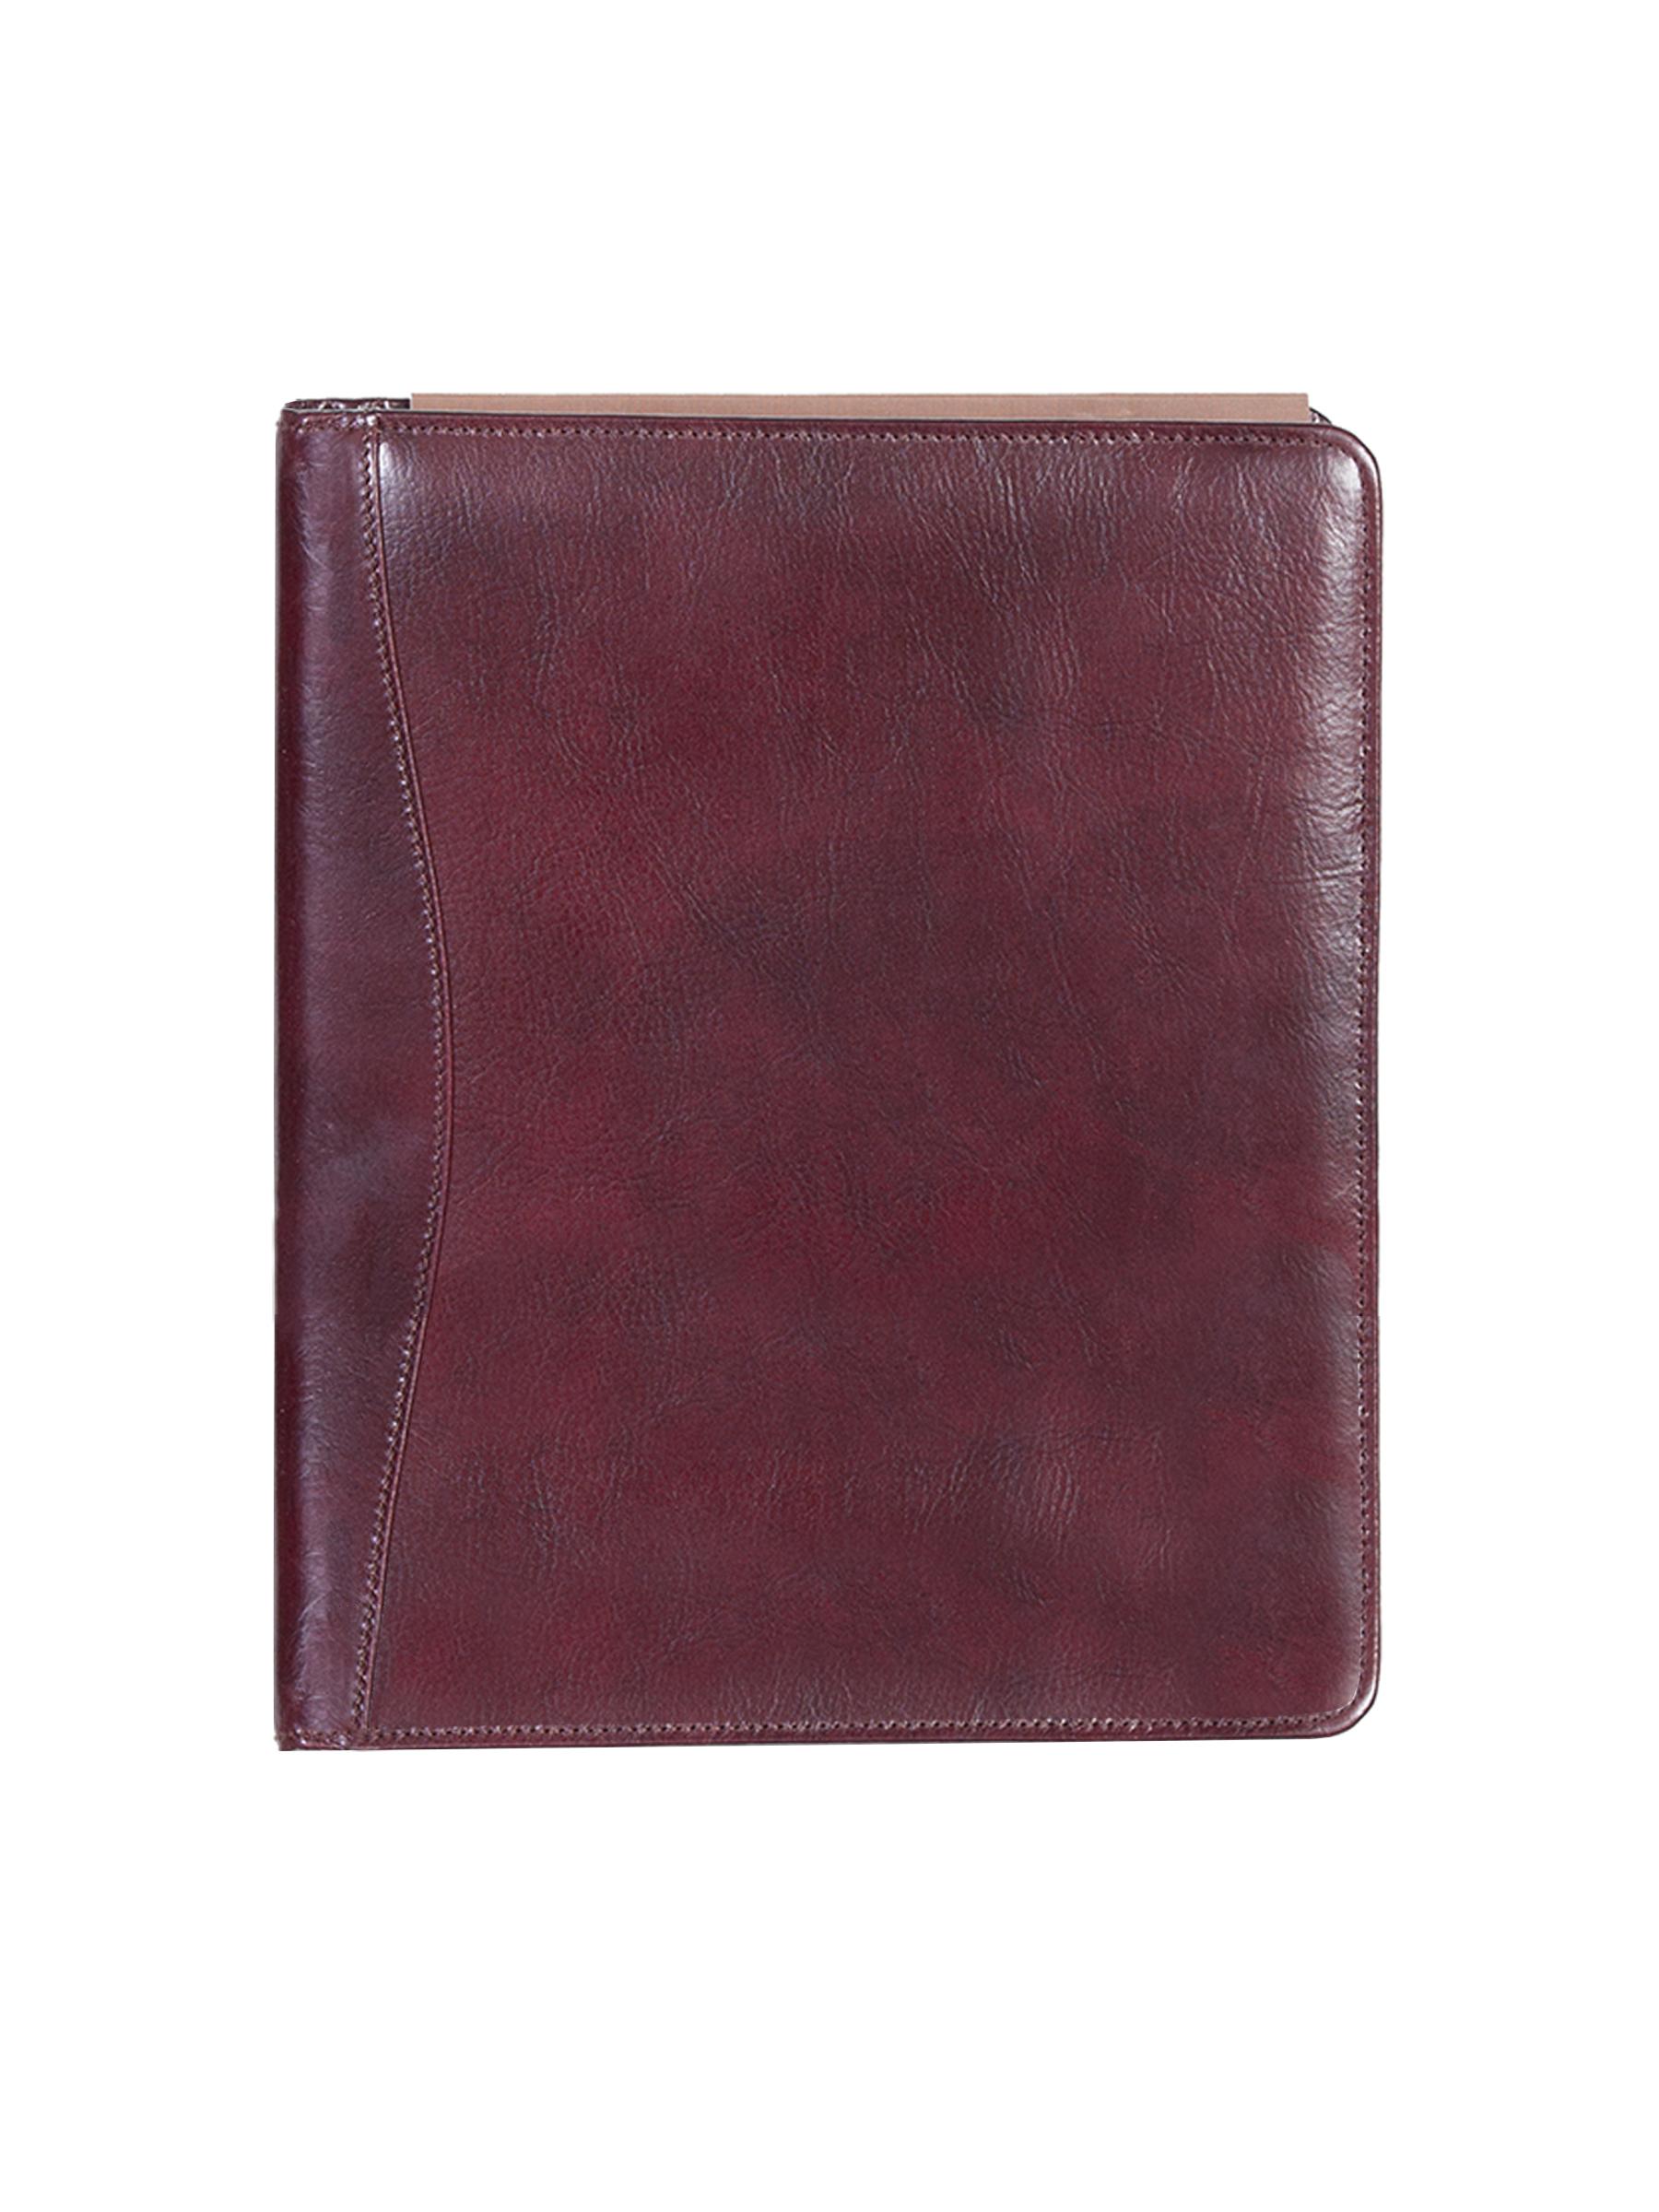 Leather 3 ring binder